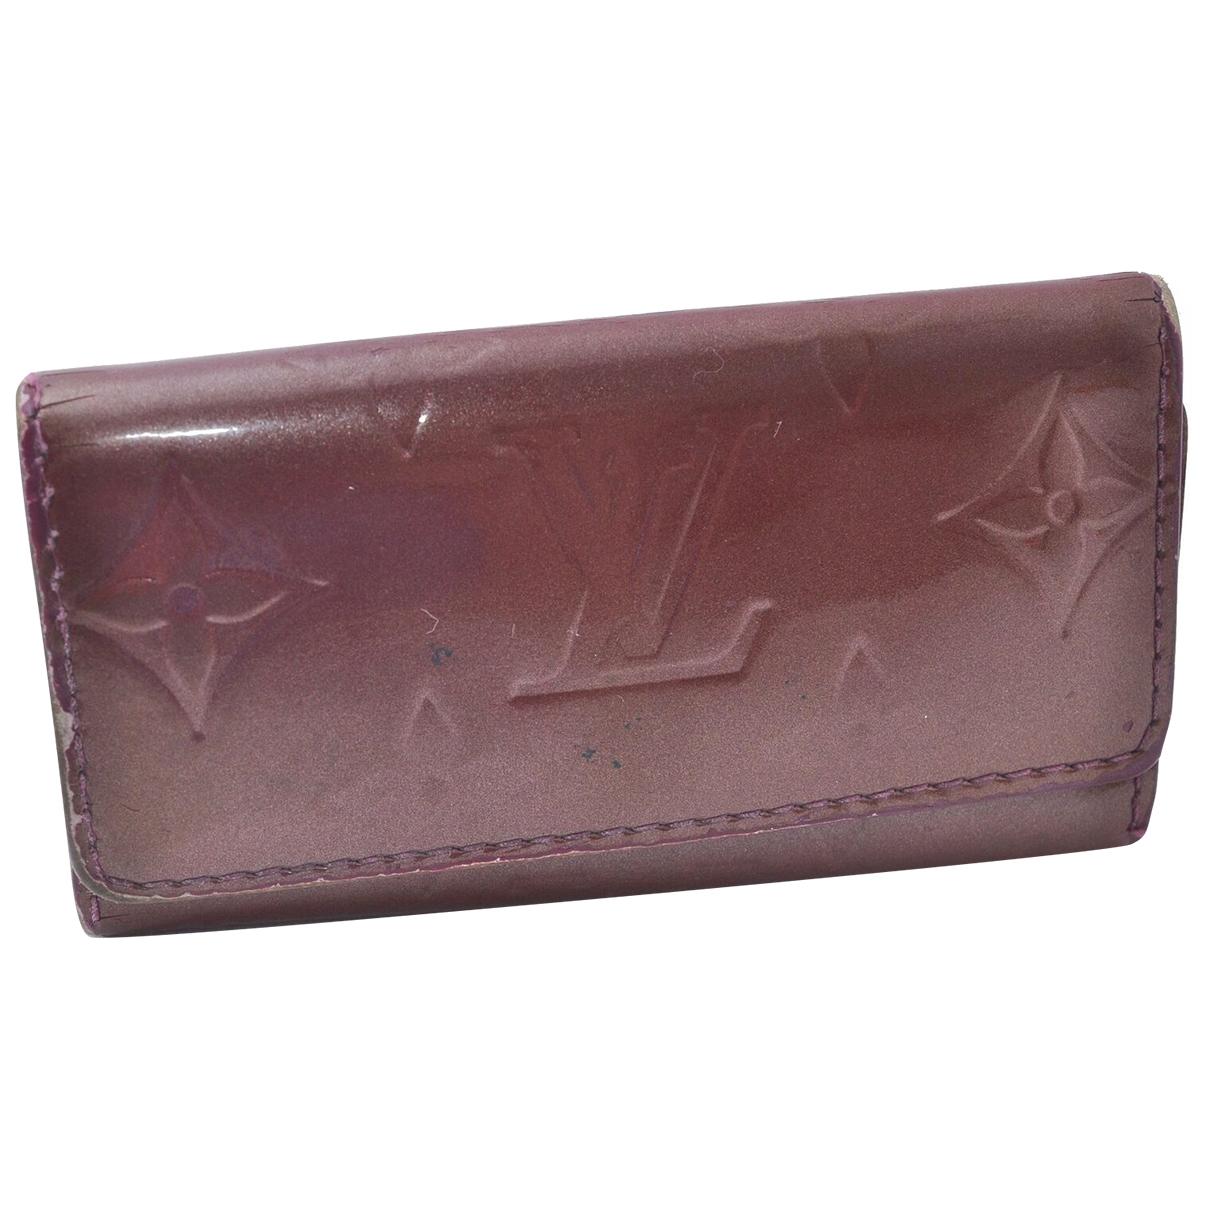 Louis Vuitton N Purple Patent leather handbag for Women N